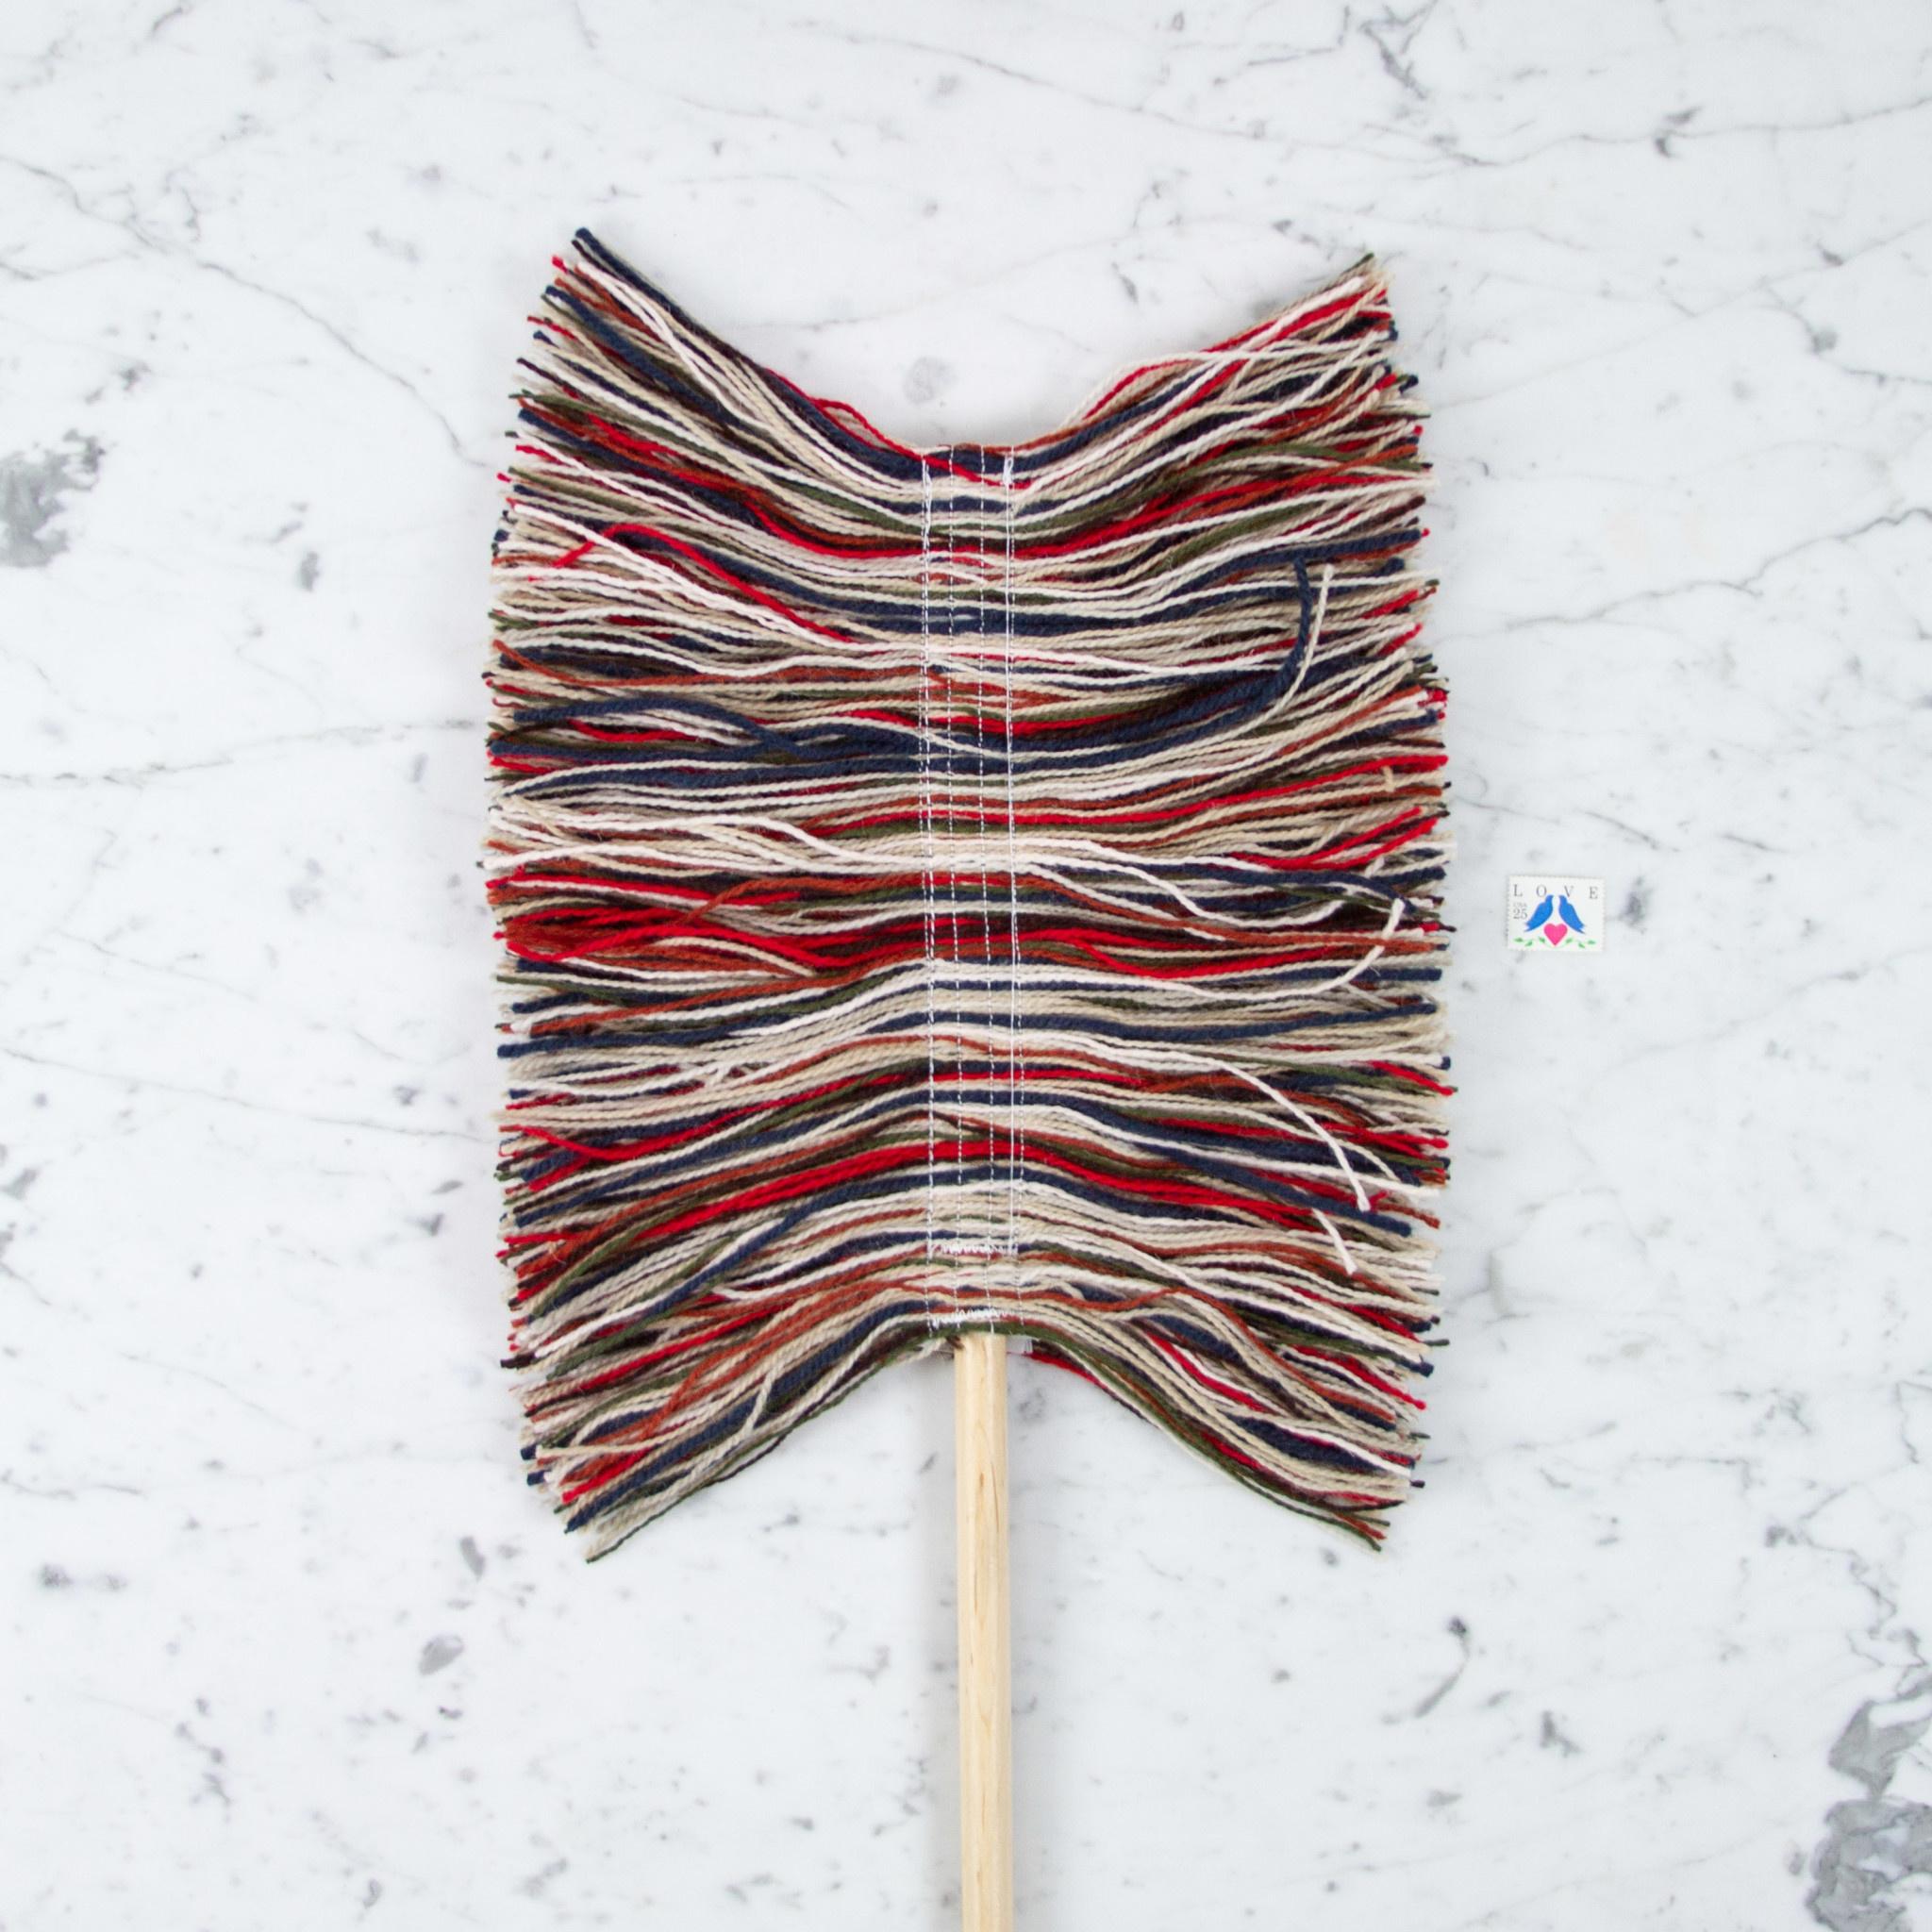 Sladust Mops Wool Hand Duster with Wooden Handle